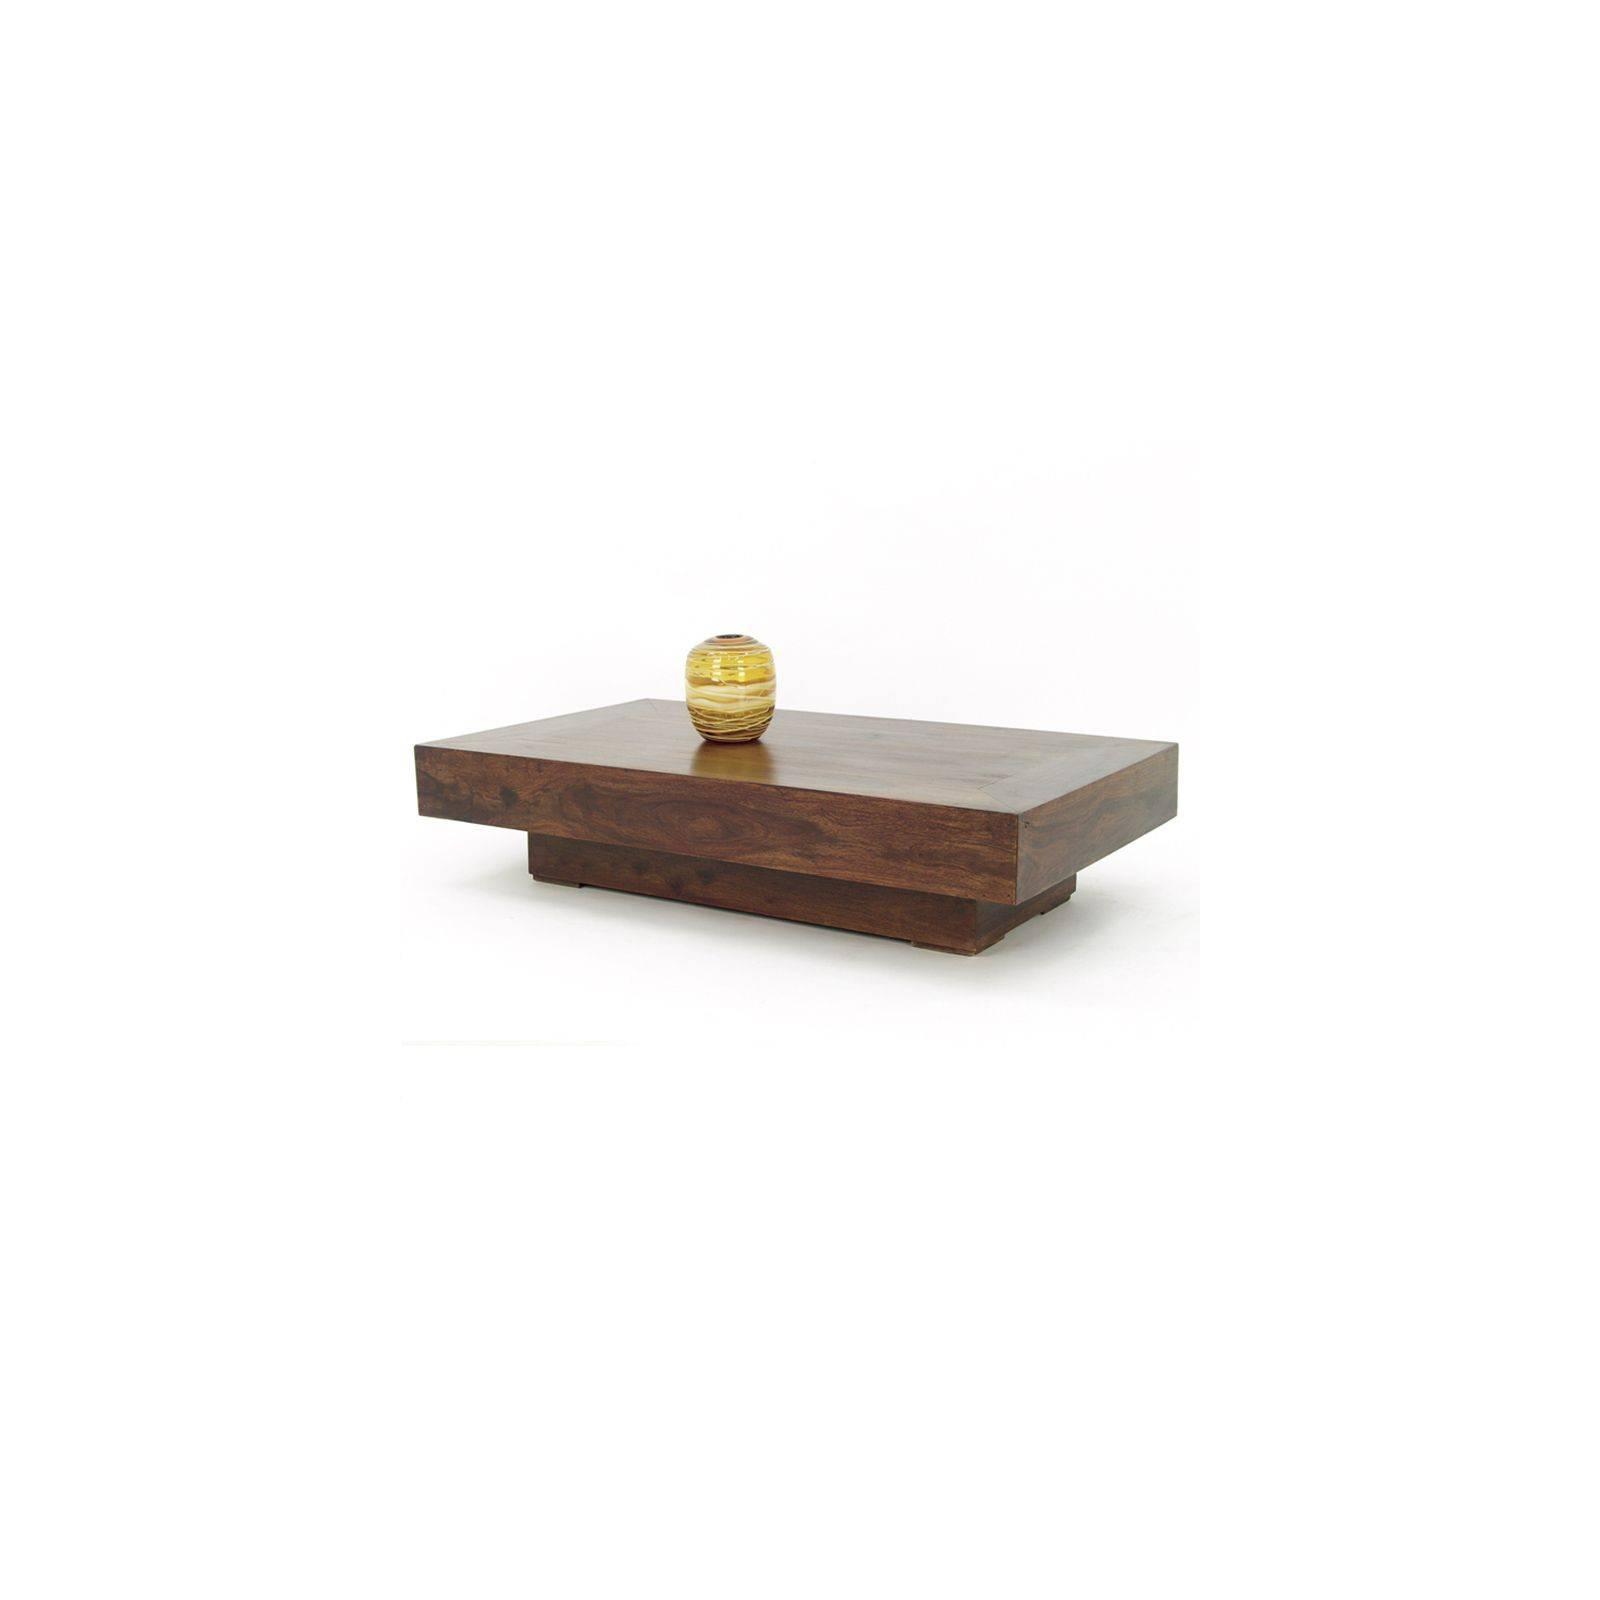 Table basse rectangulaire en palissandre massif : inspiration zen